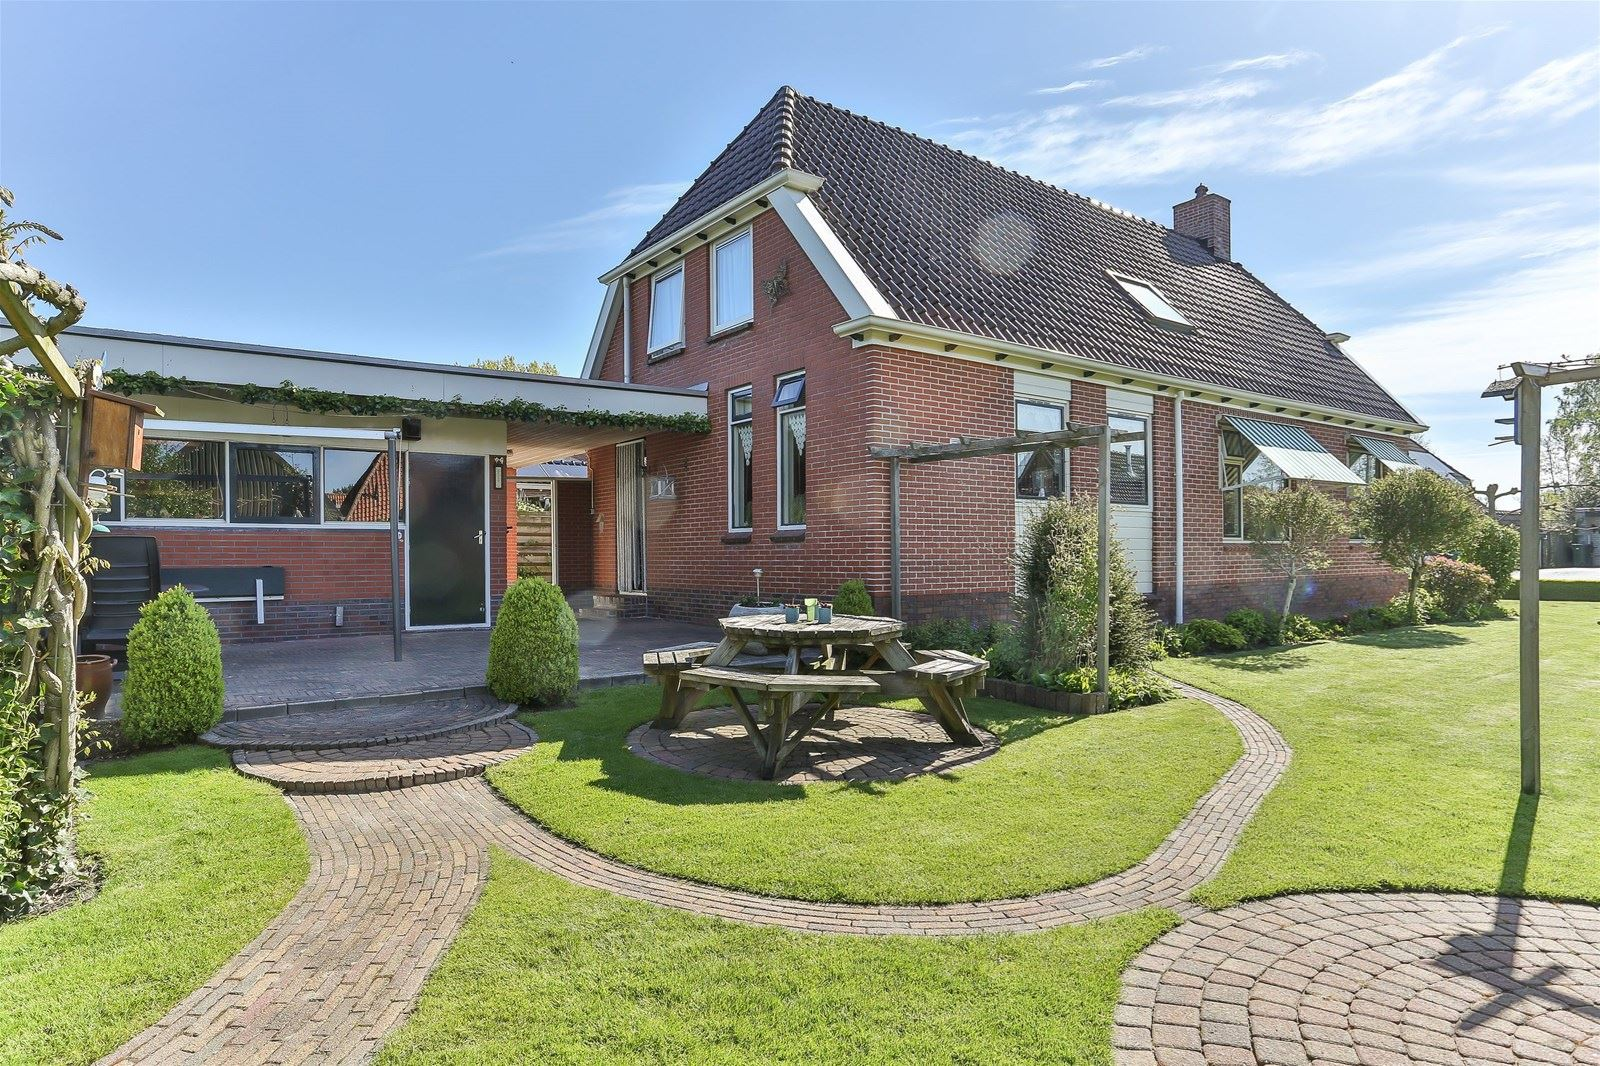 Verkocht: Donkerslaan-Zevenhuizen 12 9617 AN Harkstede [funda]